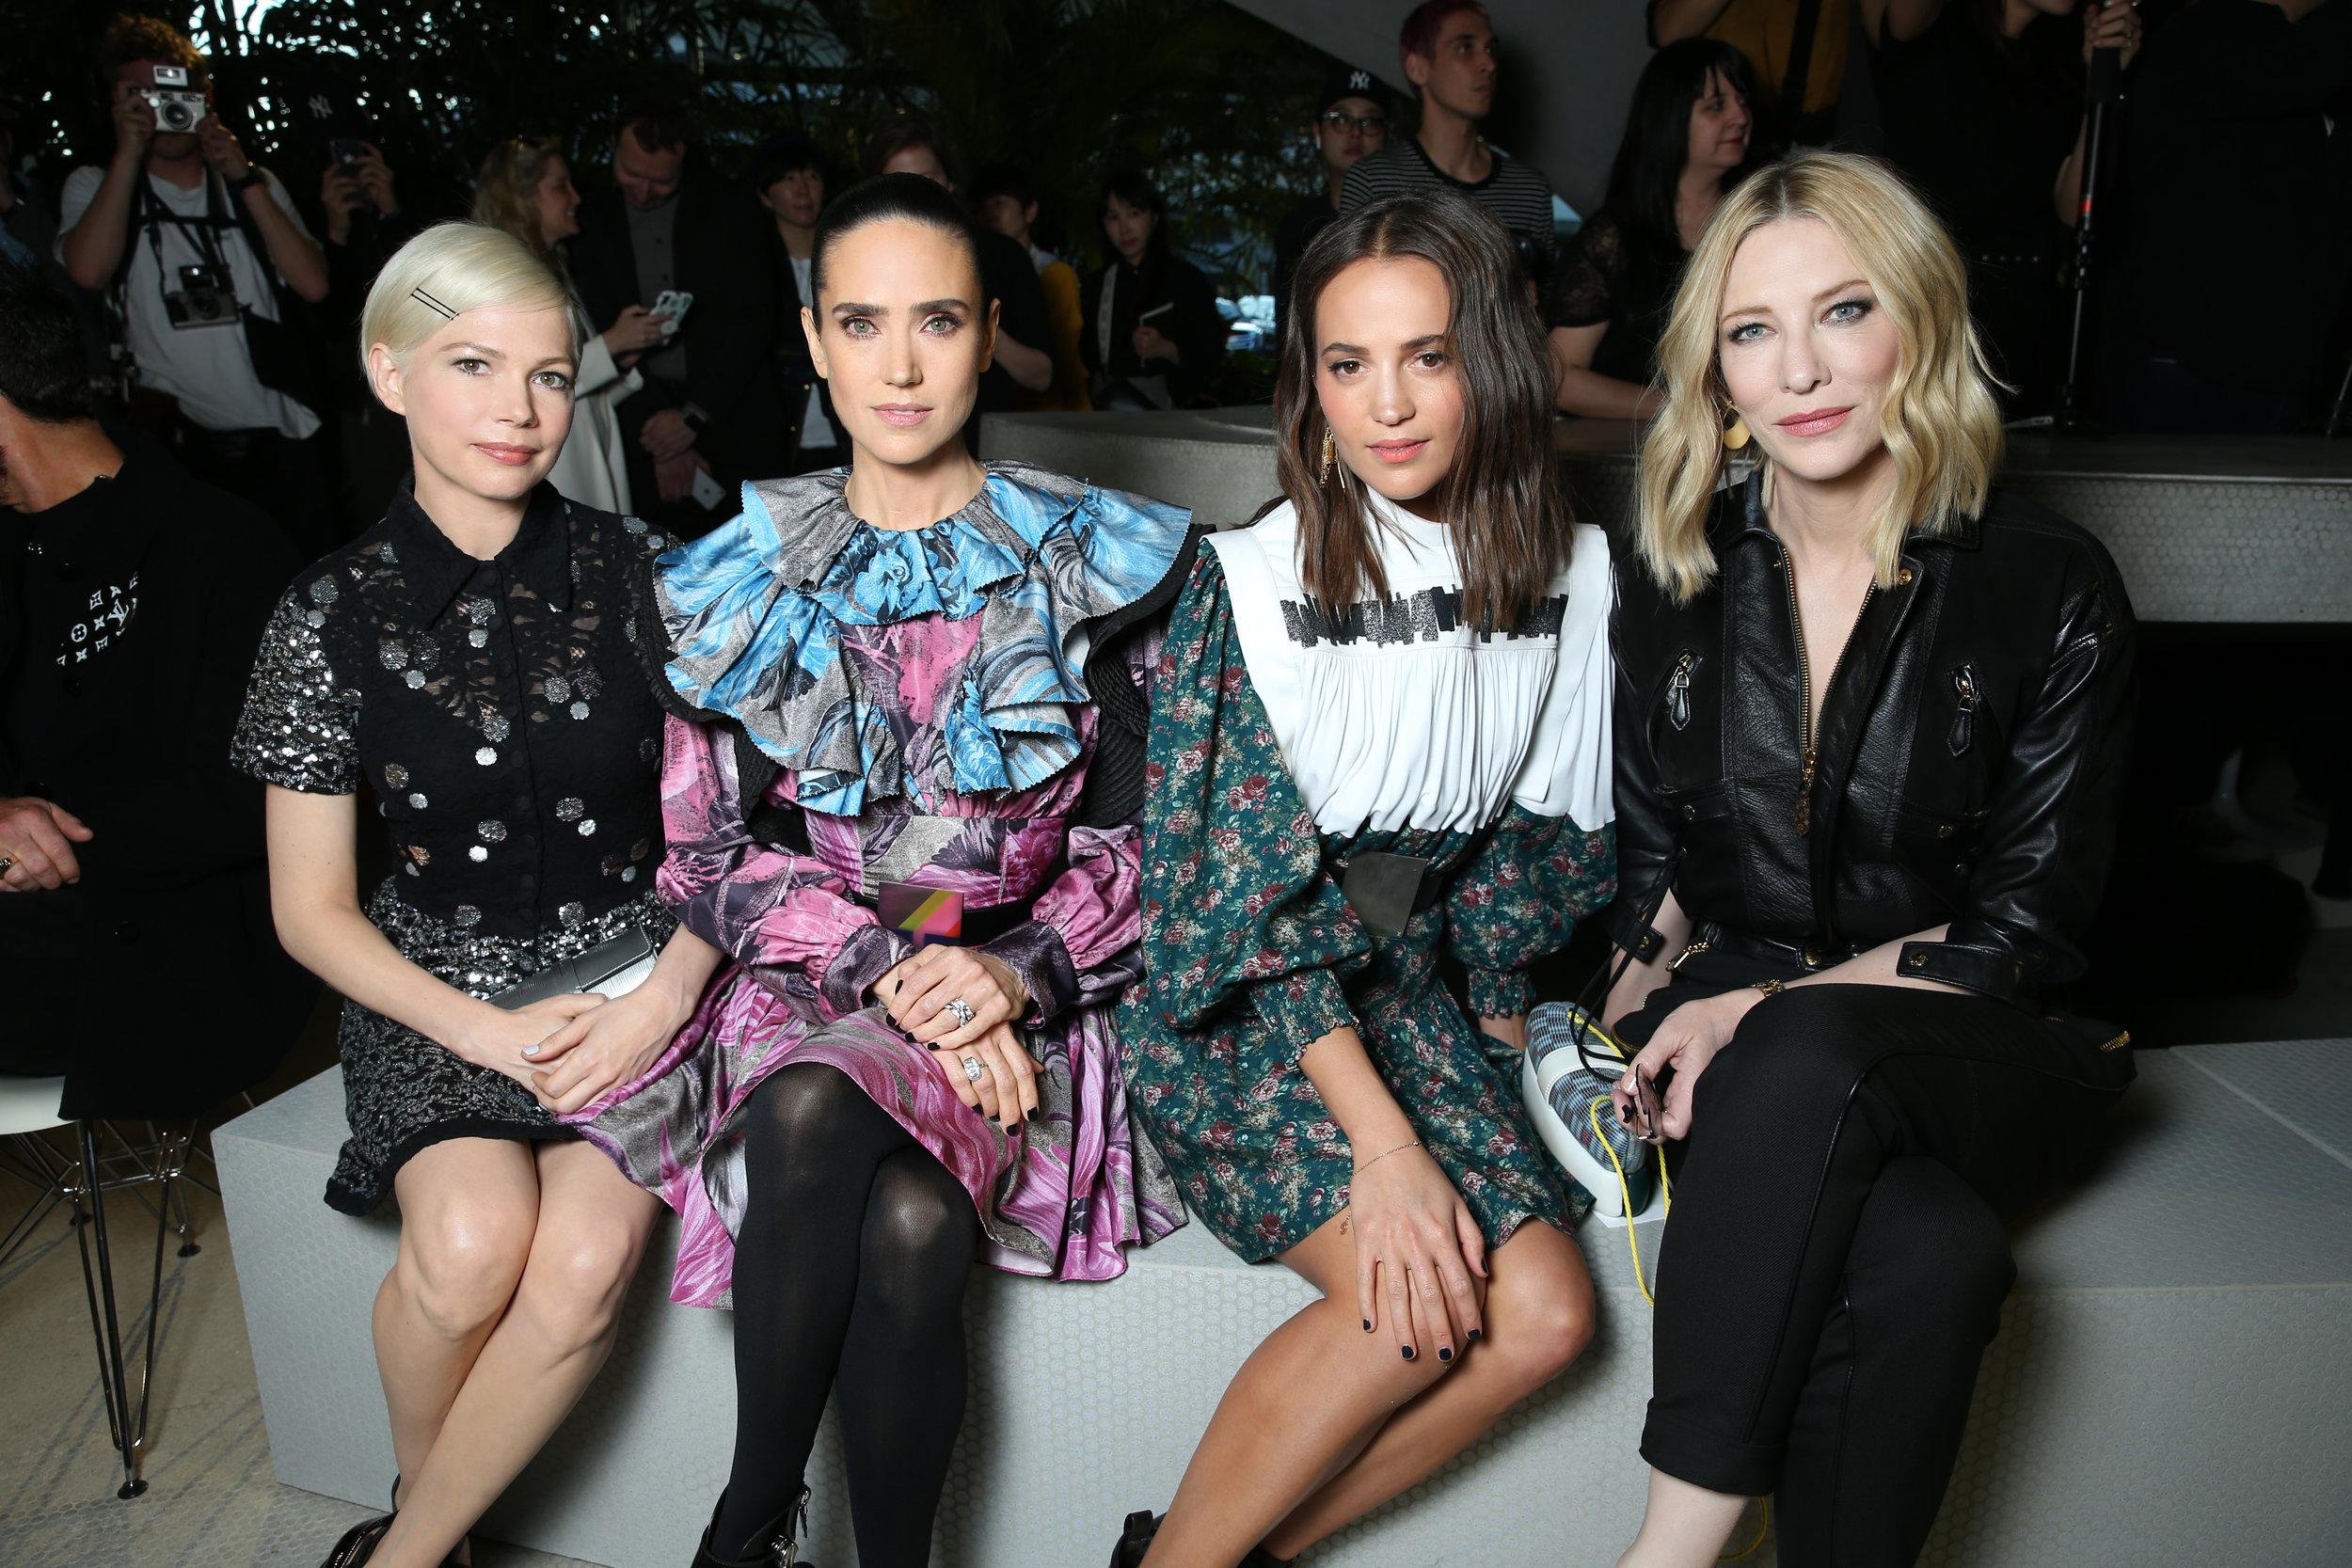 Michelle_Williams_Jennifer_Connelly_Alicia_Vikander_Cate_Blanchett-jpg.jpg